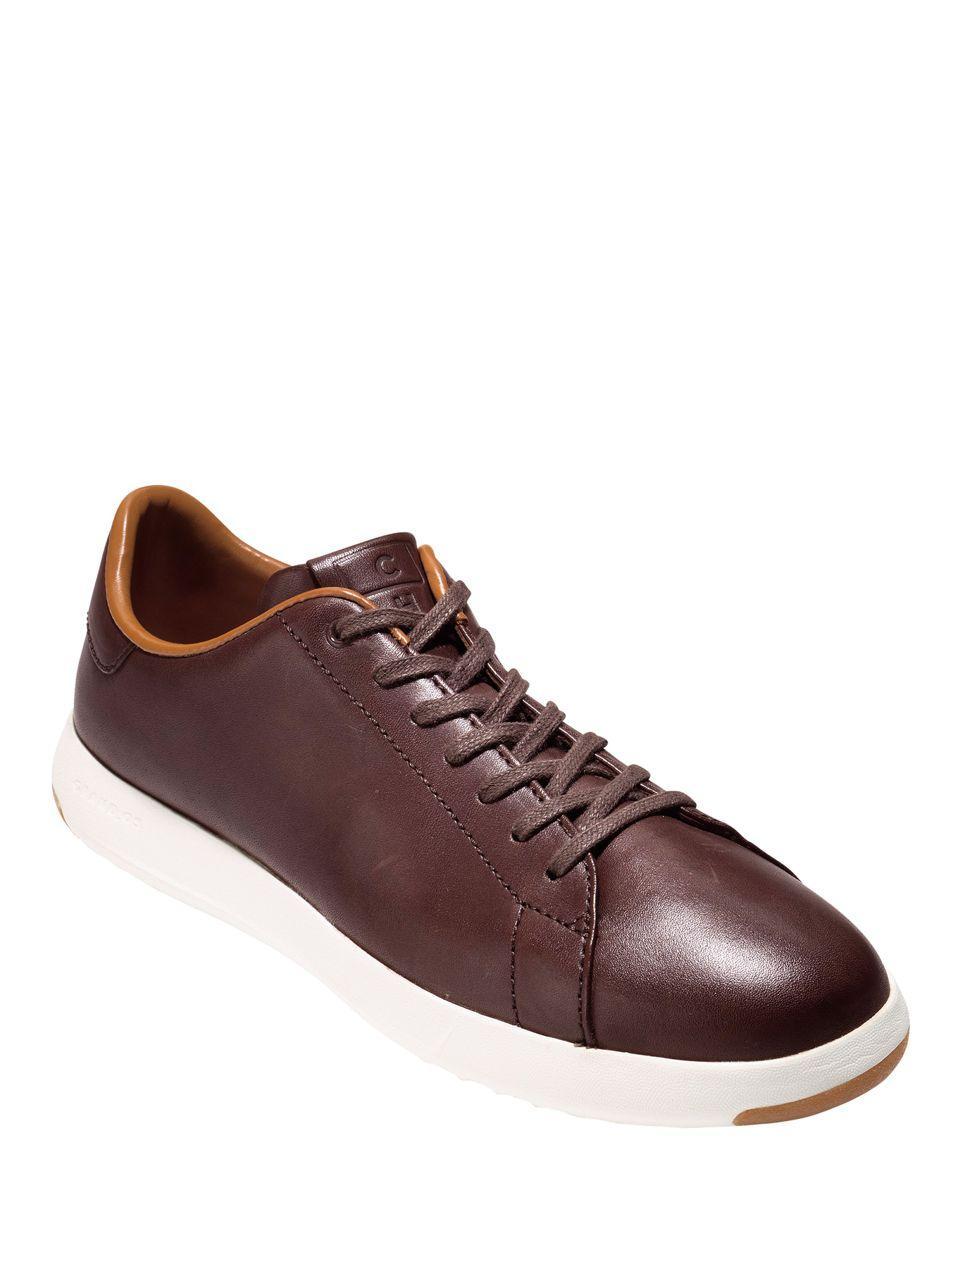 Cole Haan Men S Grandpro Tennis Shoes